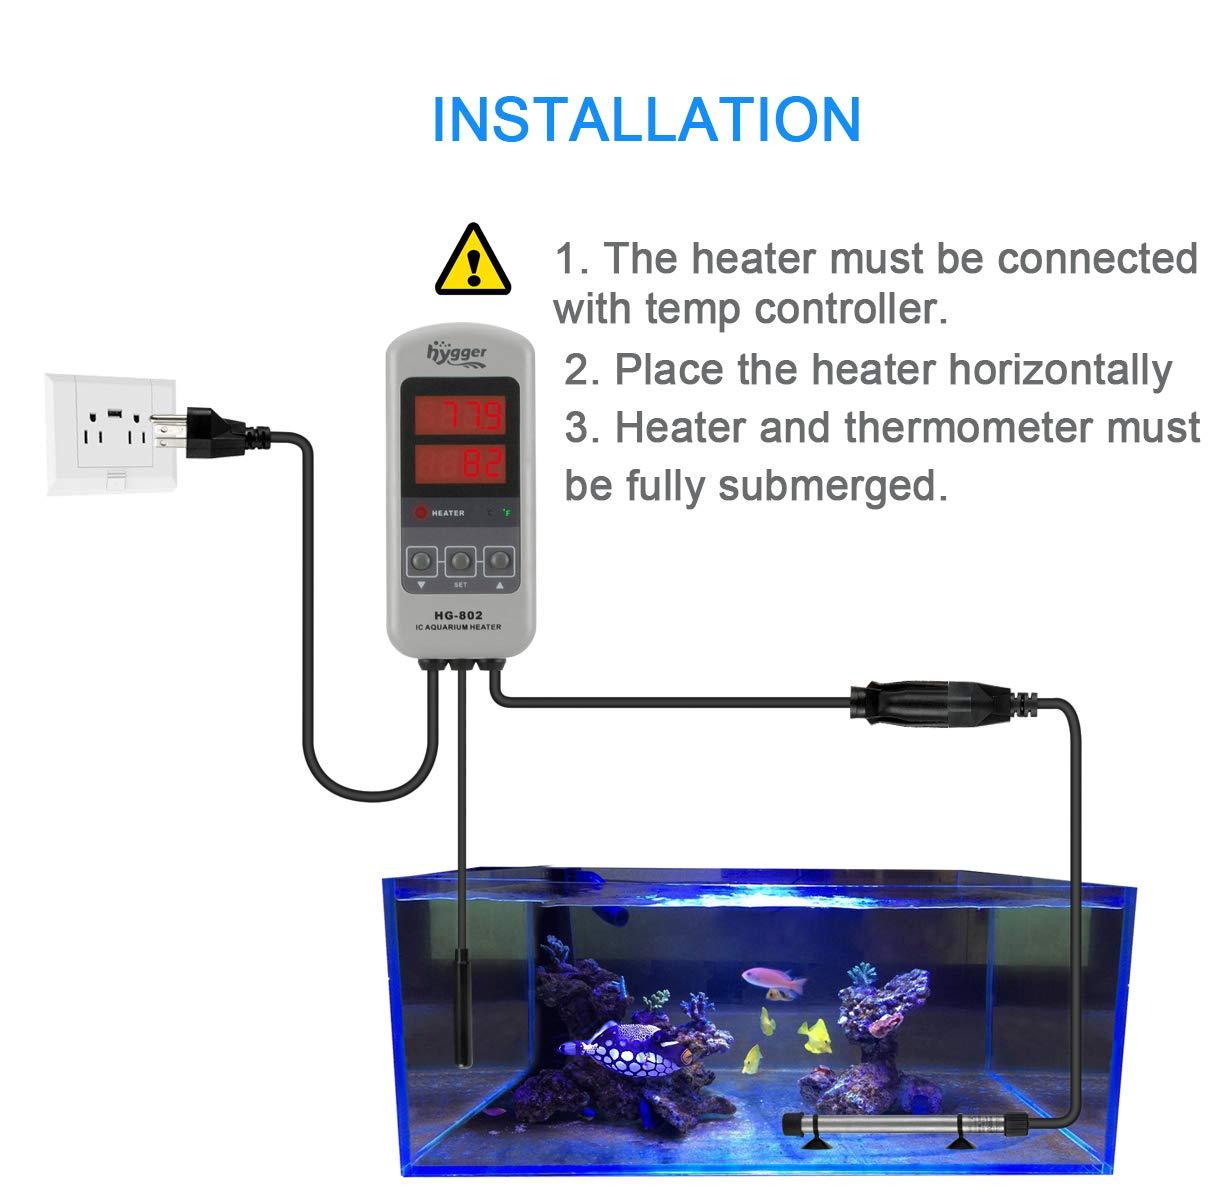 Fish & Aquariums Lower Price with D&d Schego 200w Titanium Heater